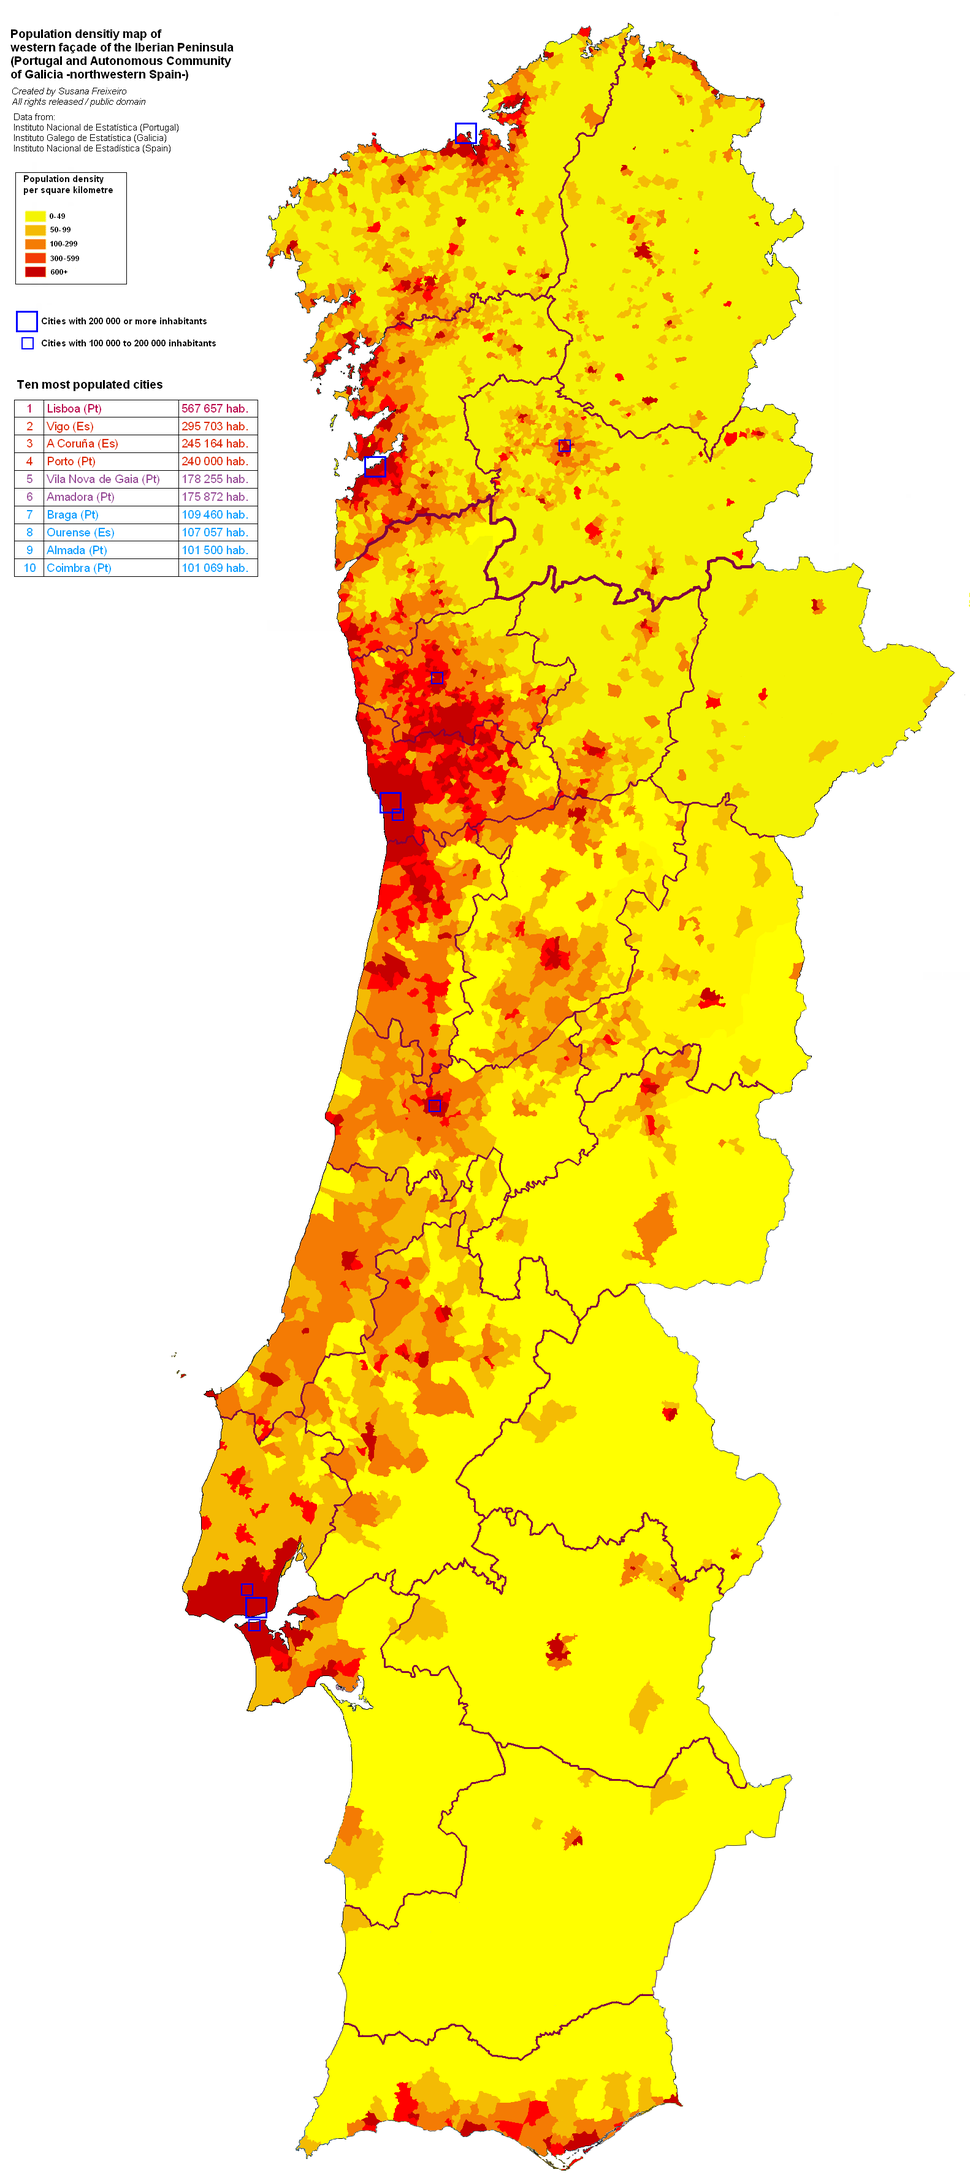 Population density of western Iberian Peninsula